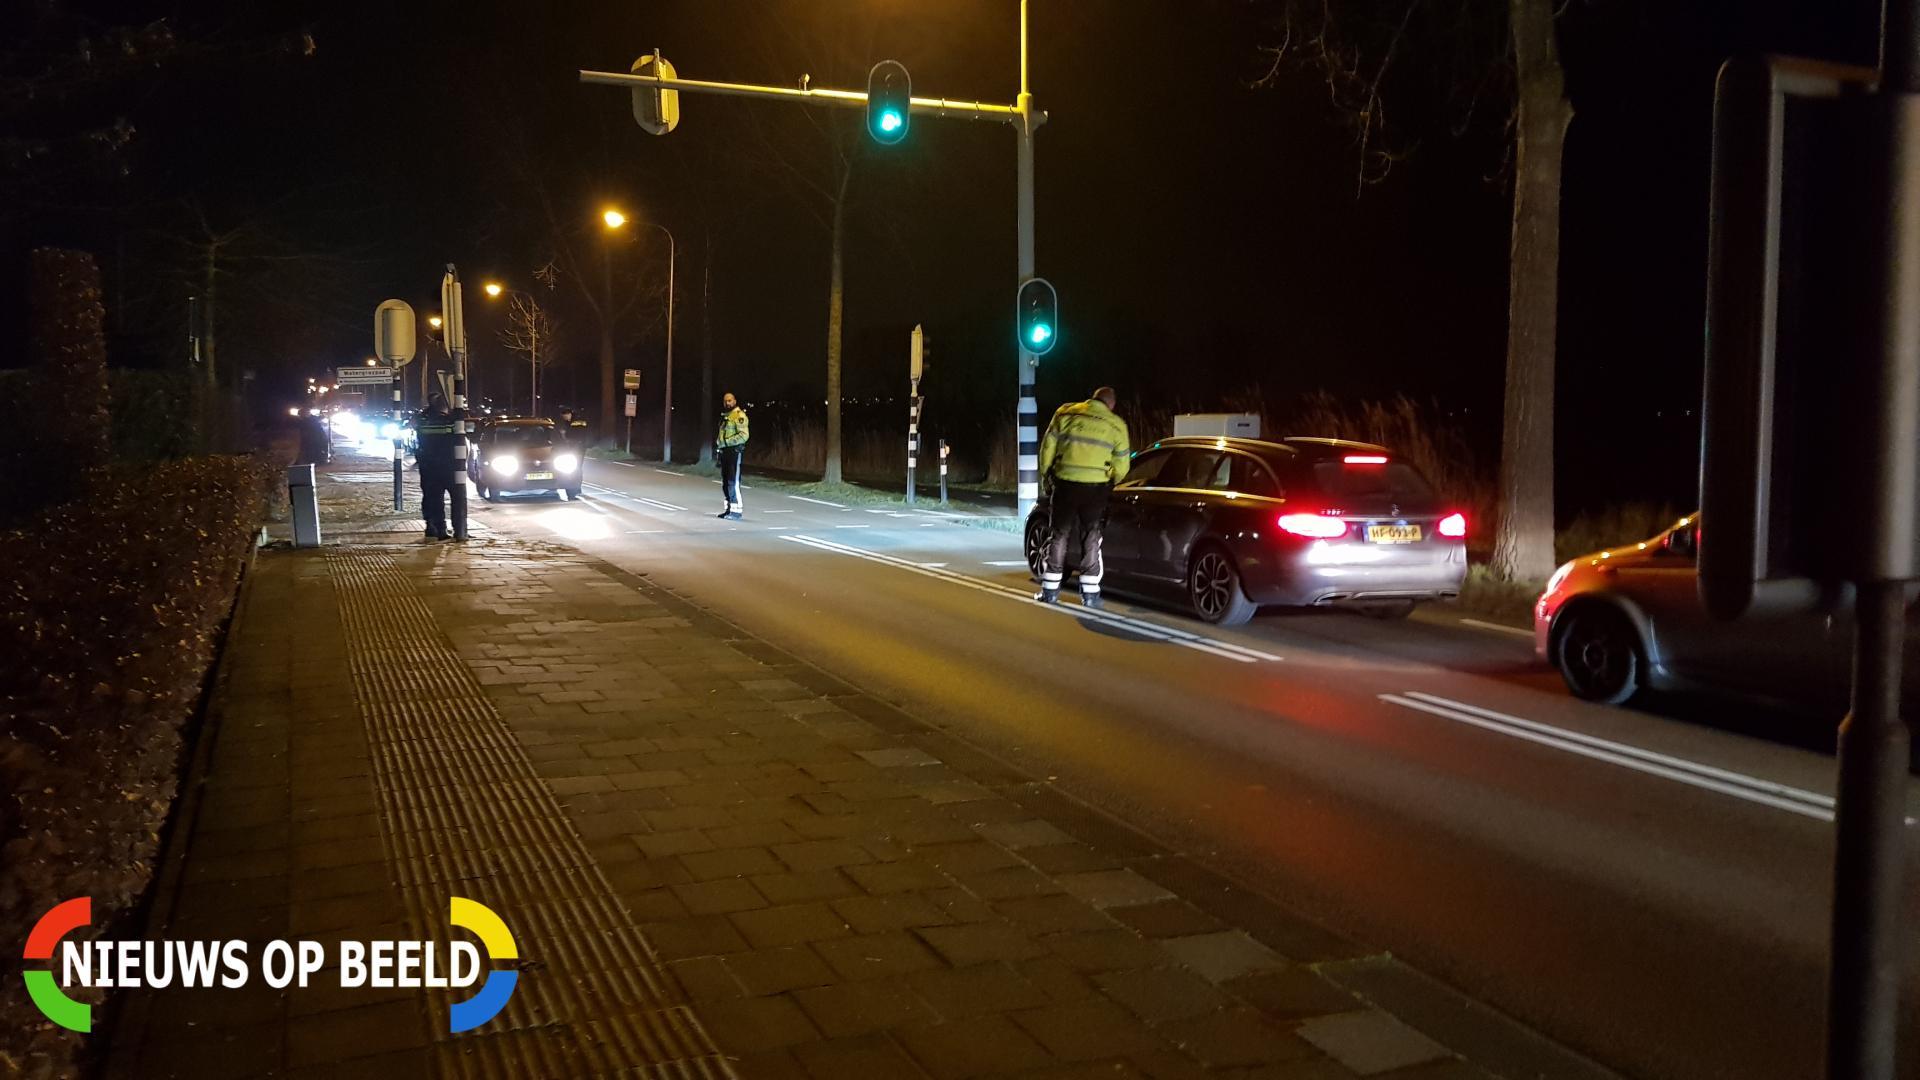 Politie houdt alcohol controle Bodegraafsestraatweg Gouda